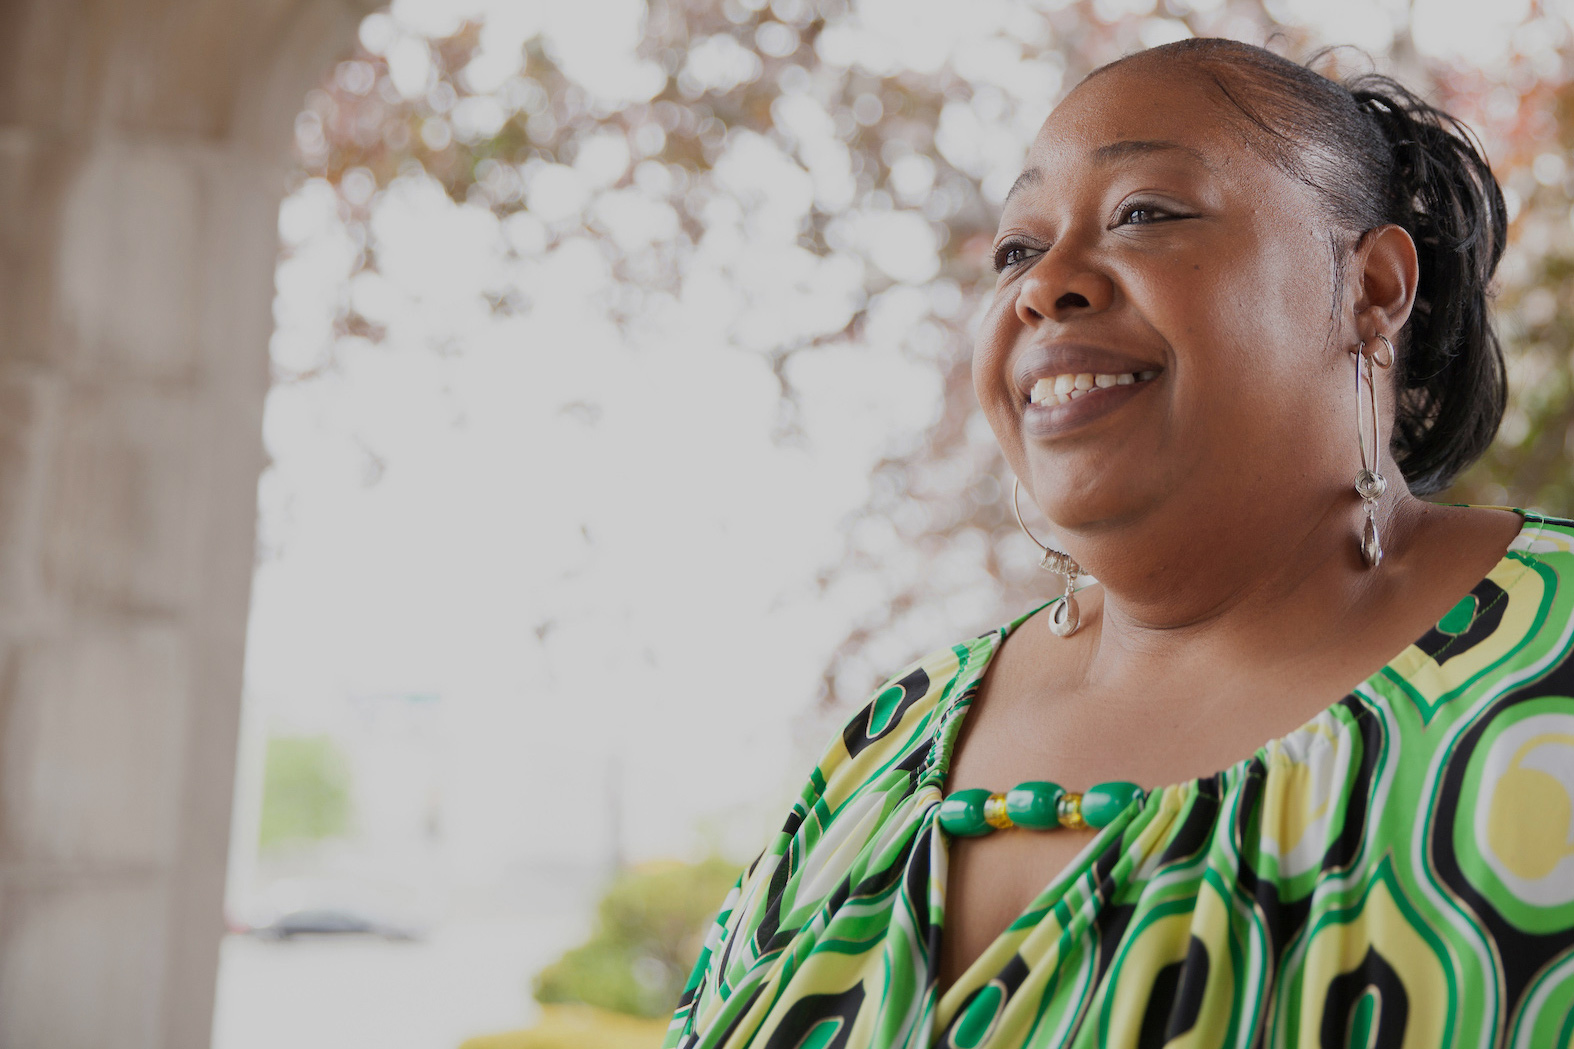 Lavette Mayes - Chicago Community Bond Fund